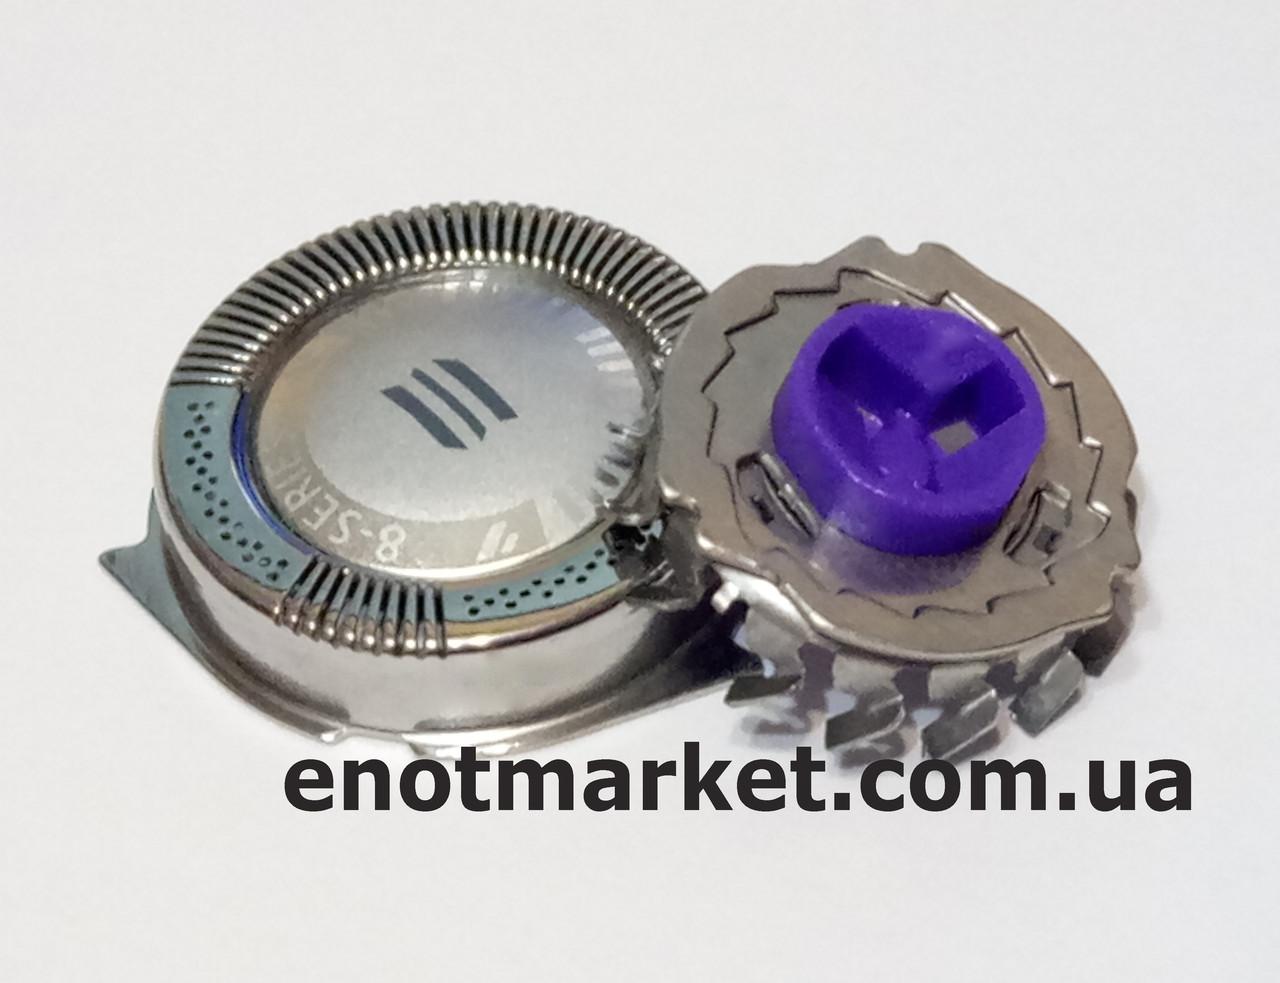 Бритвенная головка ножевая пара (комплект 1 сеточка + 1 лезвие) электробритвы Philips (аналог) HQ, AT, PT, XL